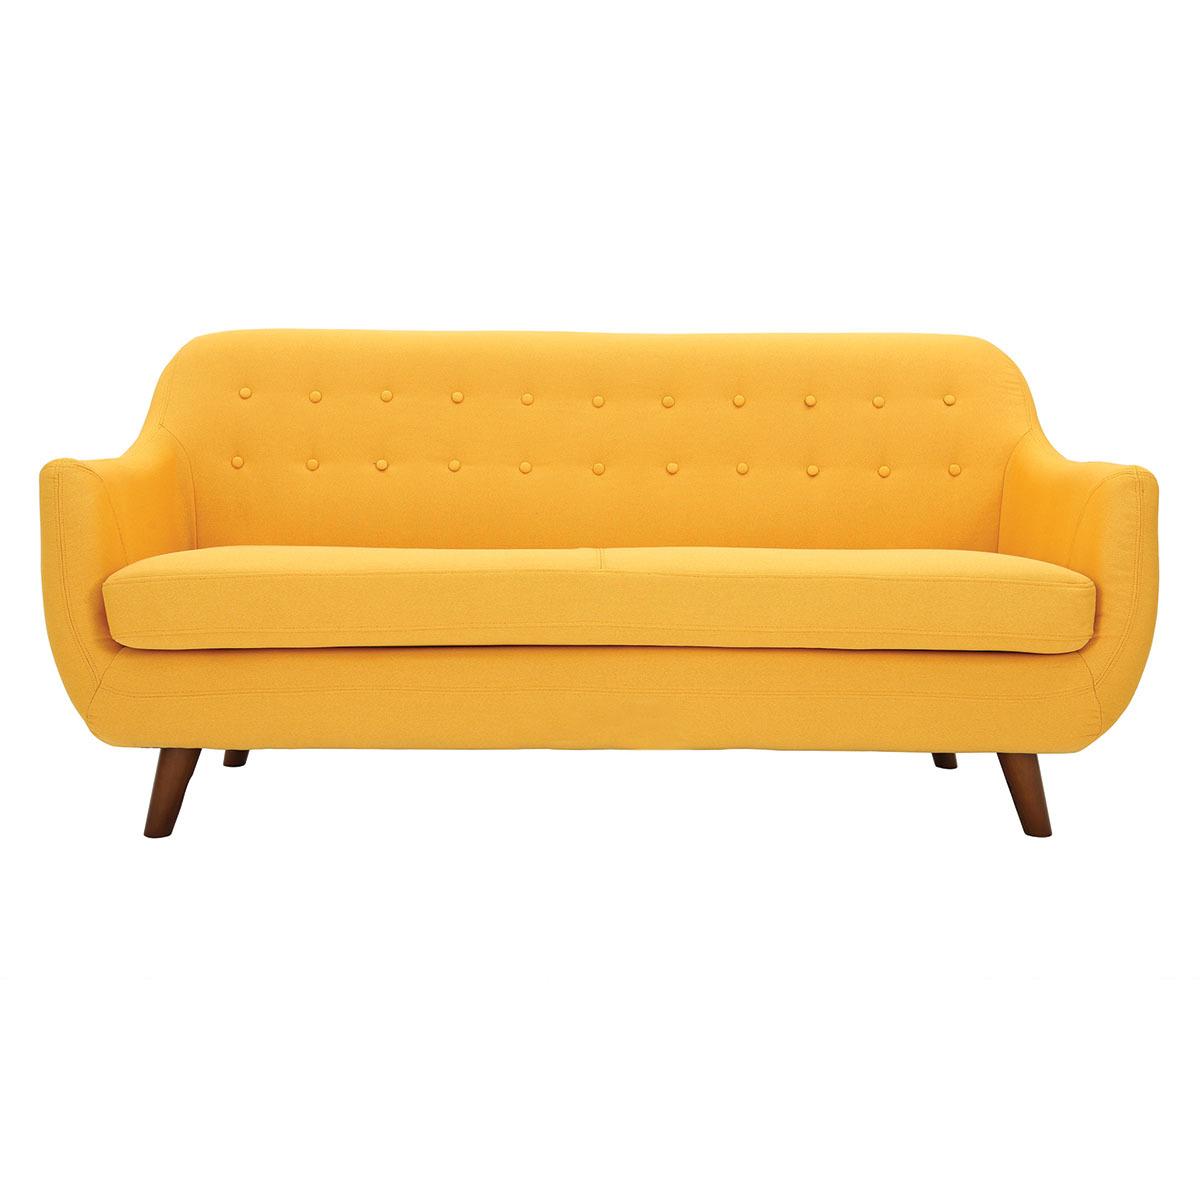 Divano design 3 posti sfoderabile giallo YNOK